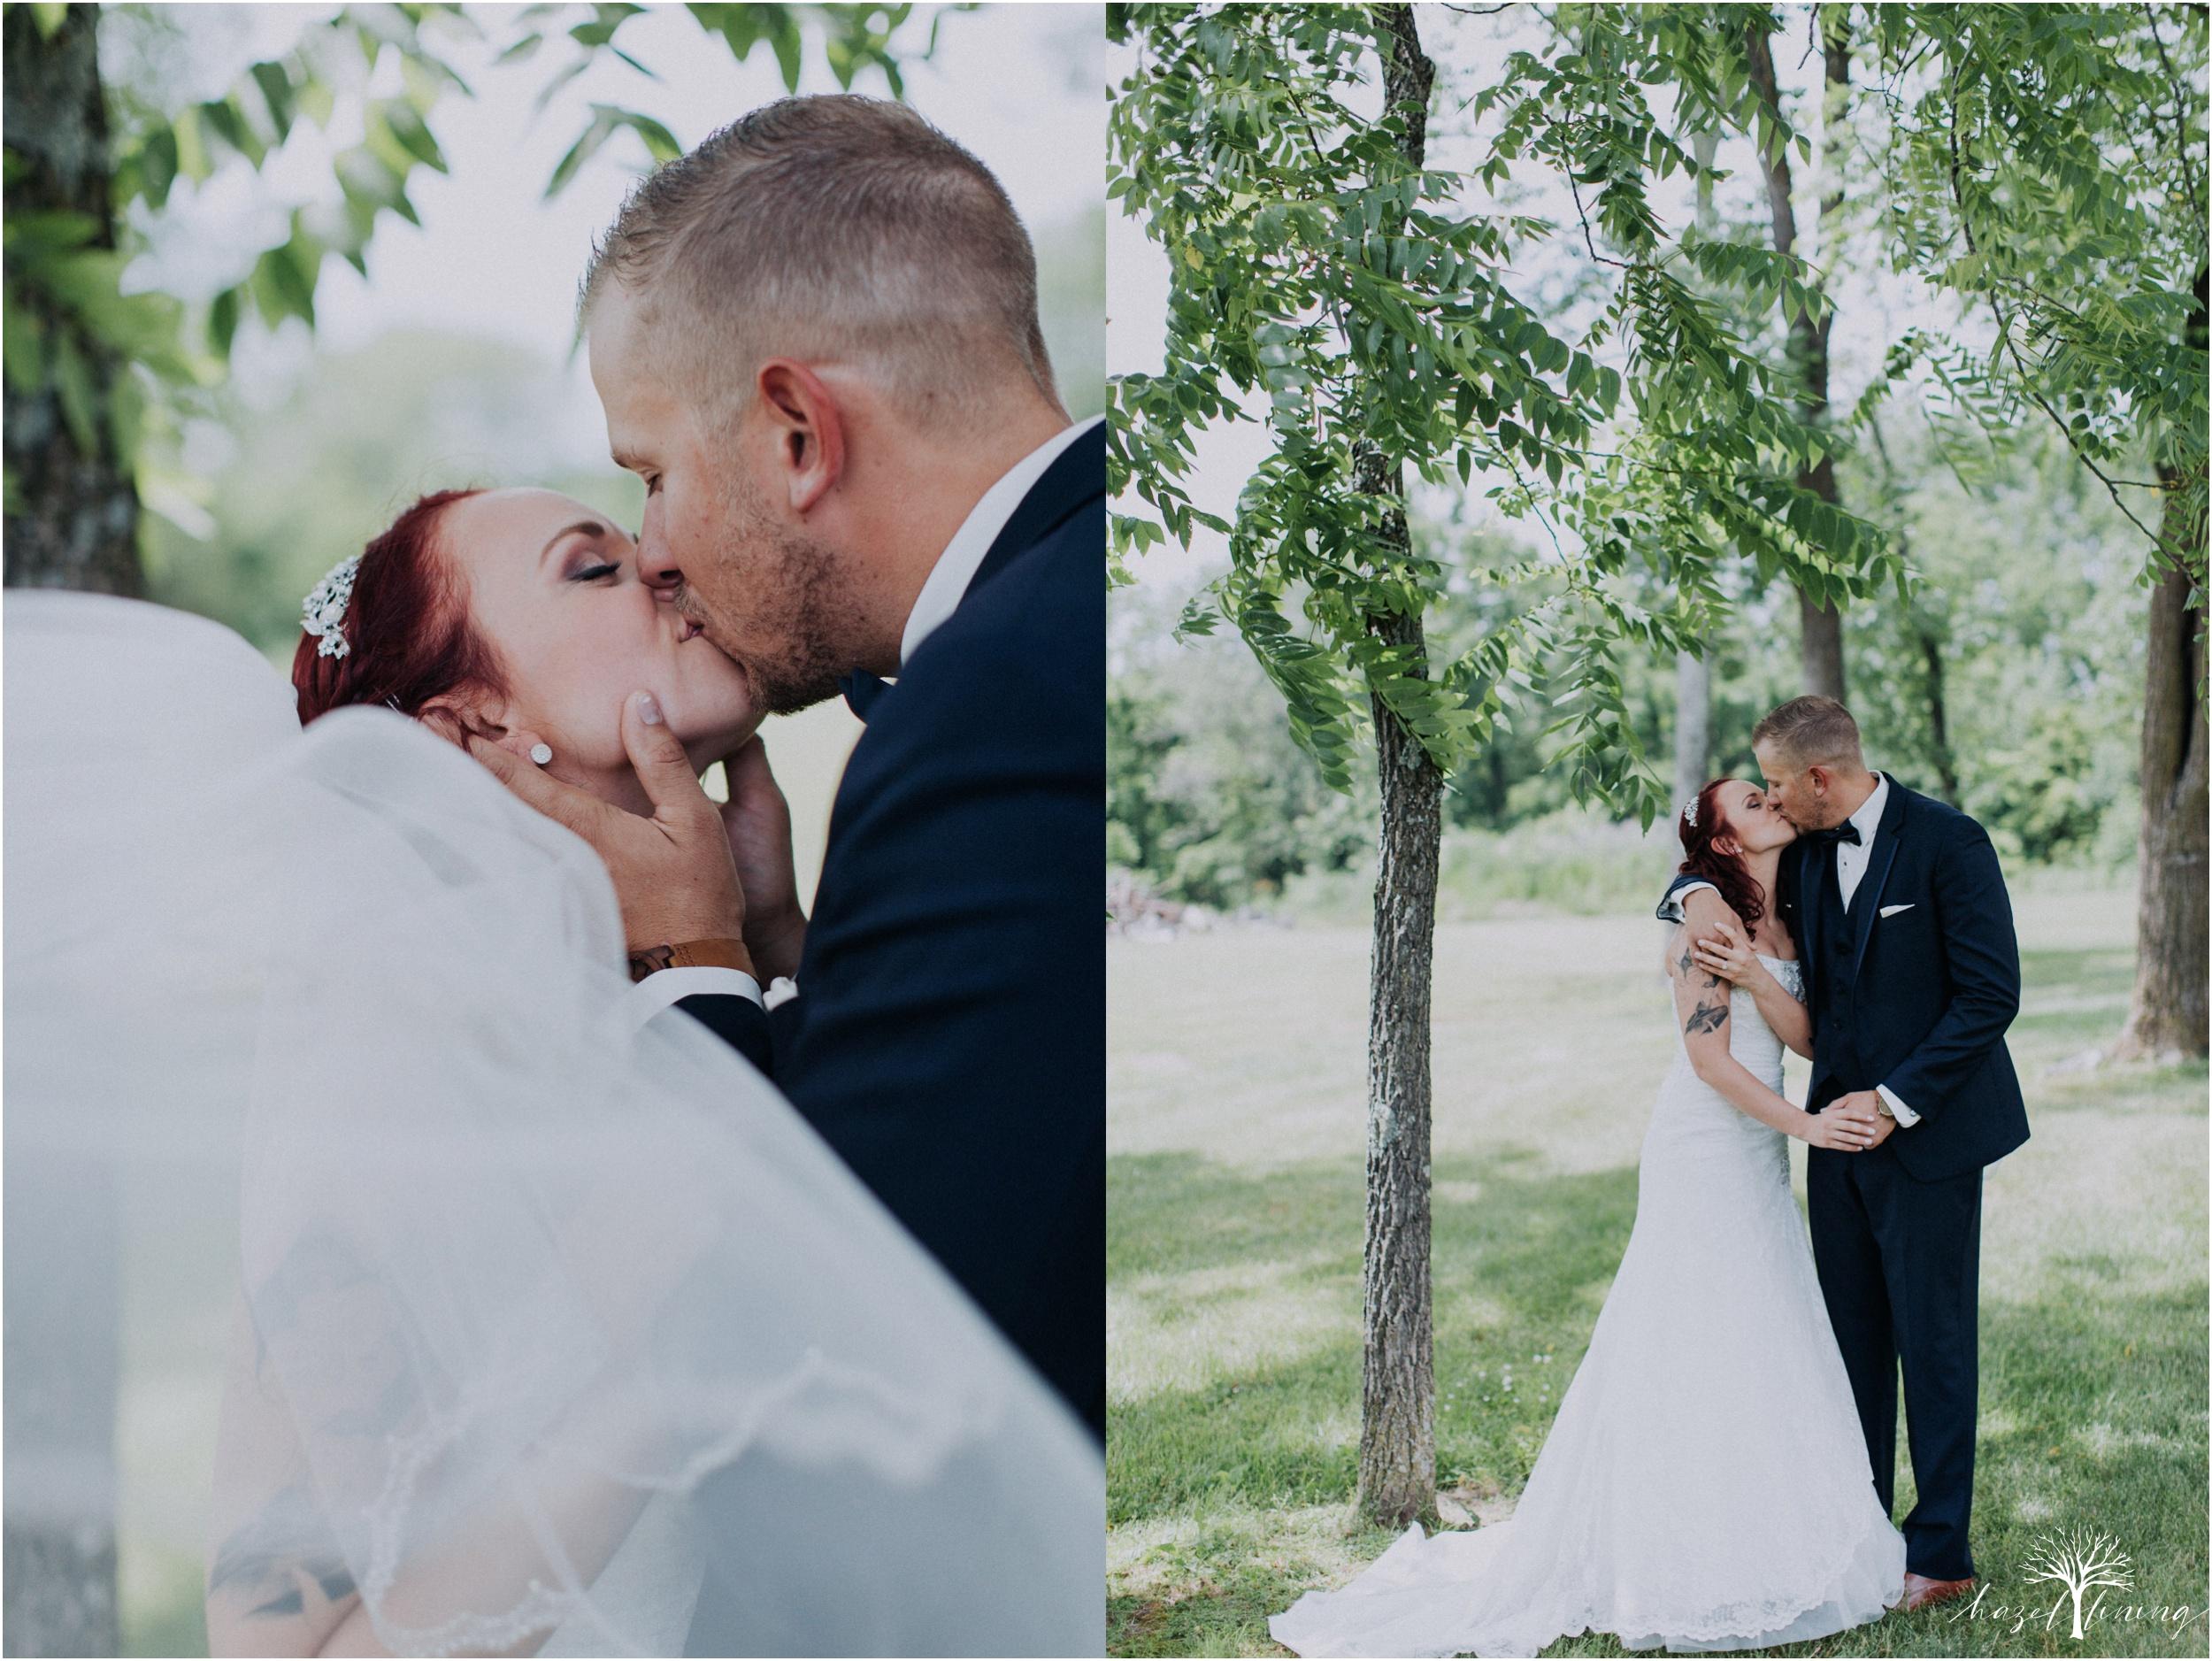 alyssa-james-stiteler-wedding-loft-and-sweet-water-cc-pennsburg-pennsylvania-hazel-lining-travel-wedding-elopement-photography_0040.jpg